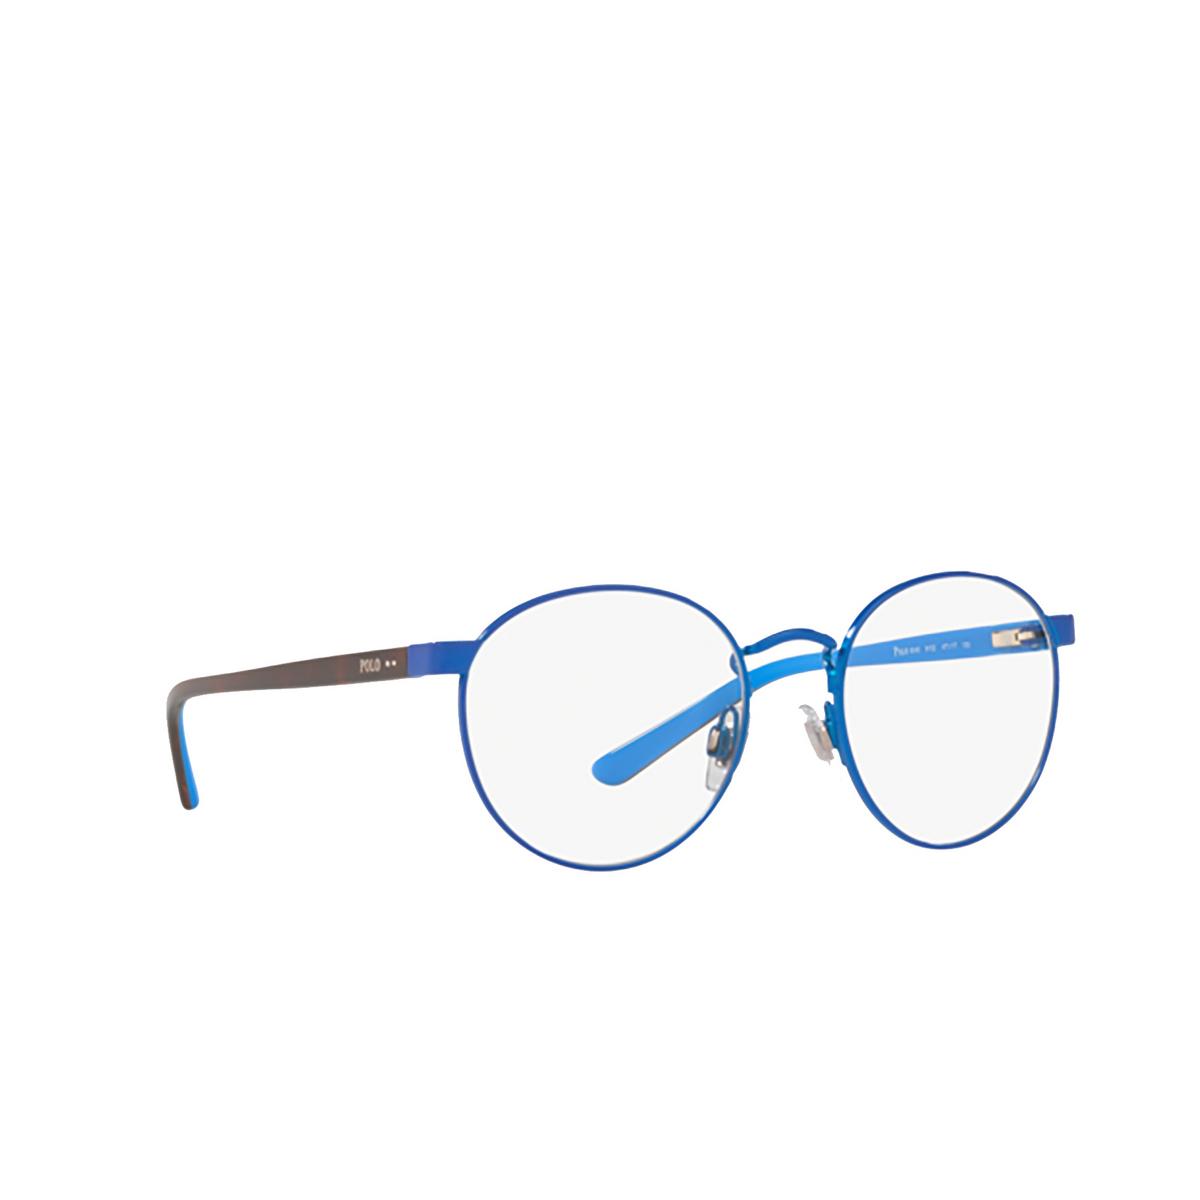 Polo Ralph Lauren® Round Eyeglasses: PP8040 color Shiny Electric Blue 9102.